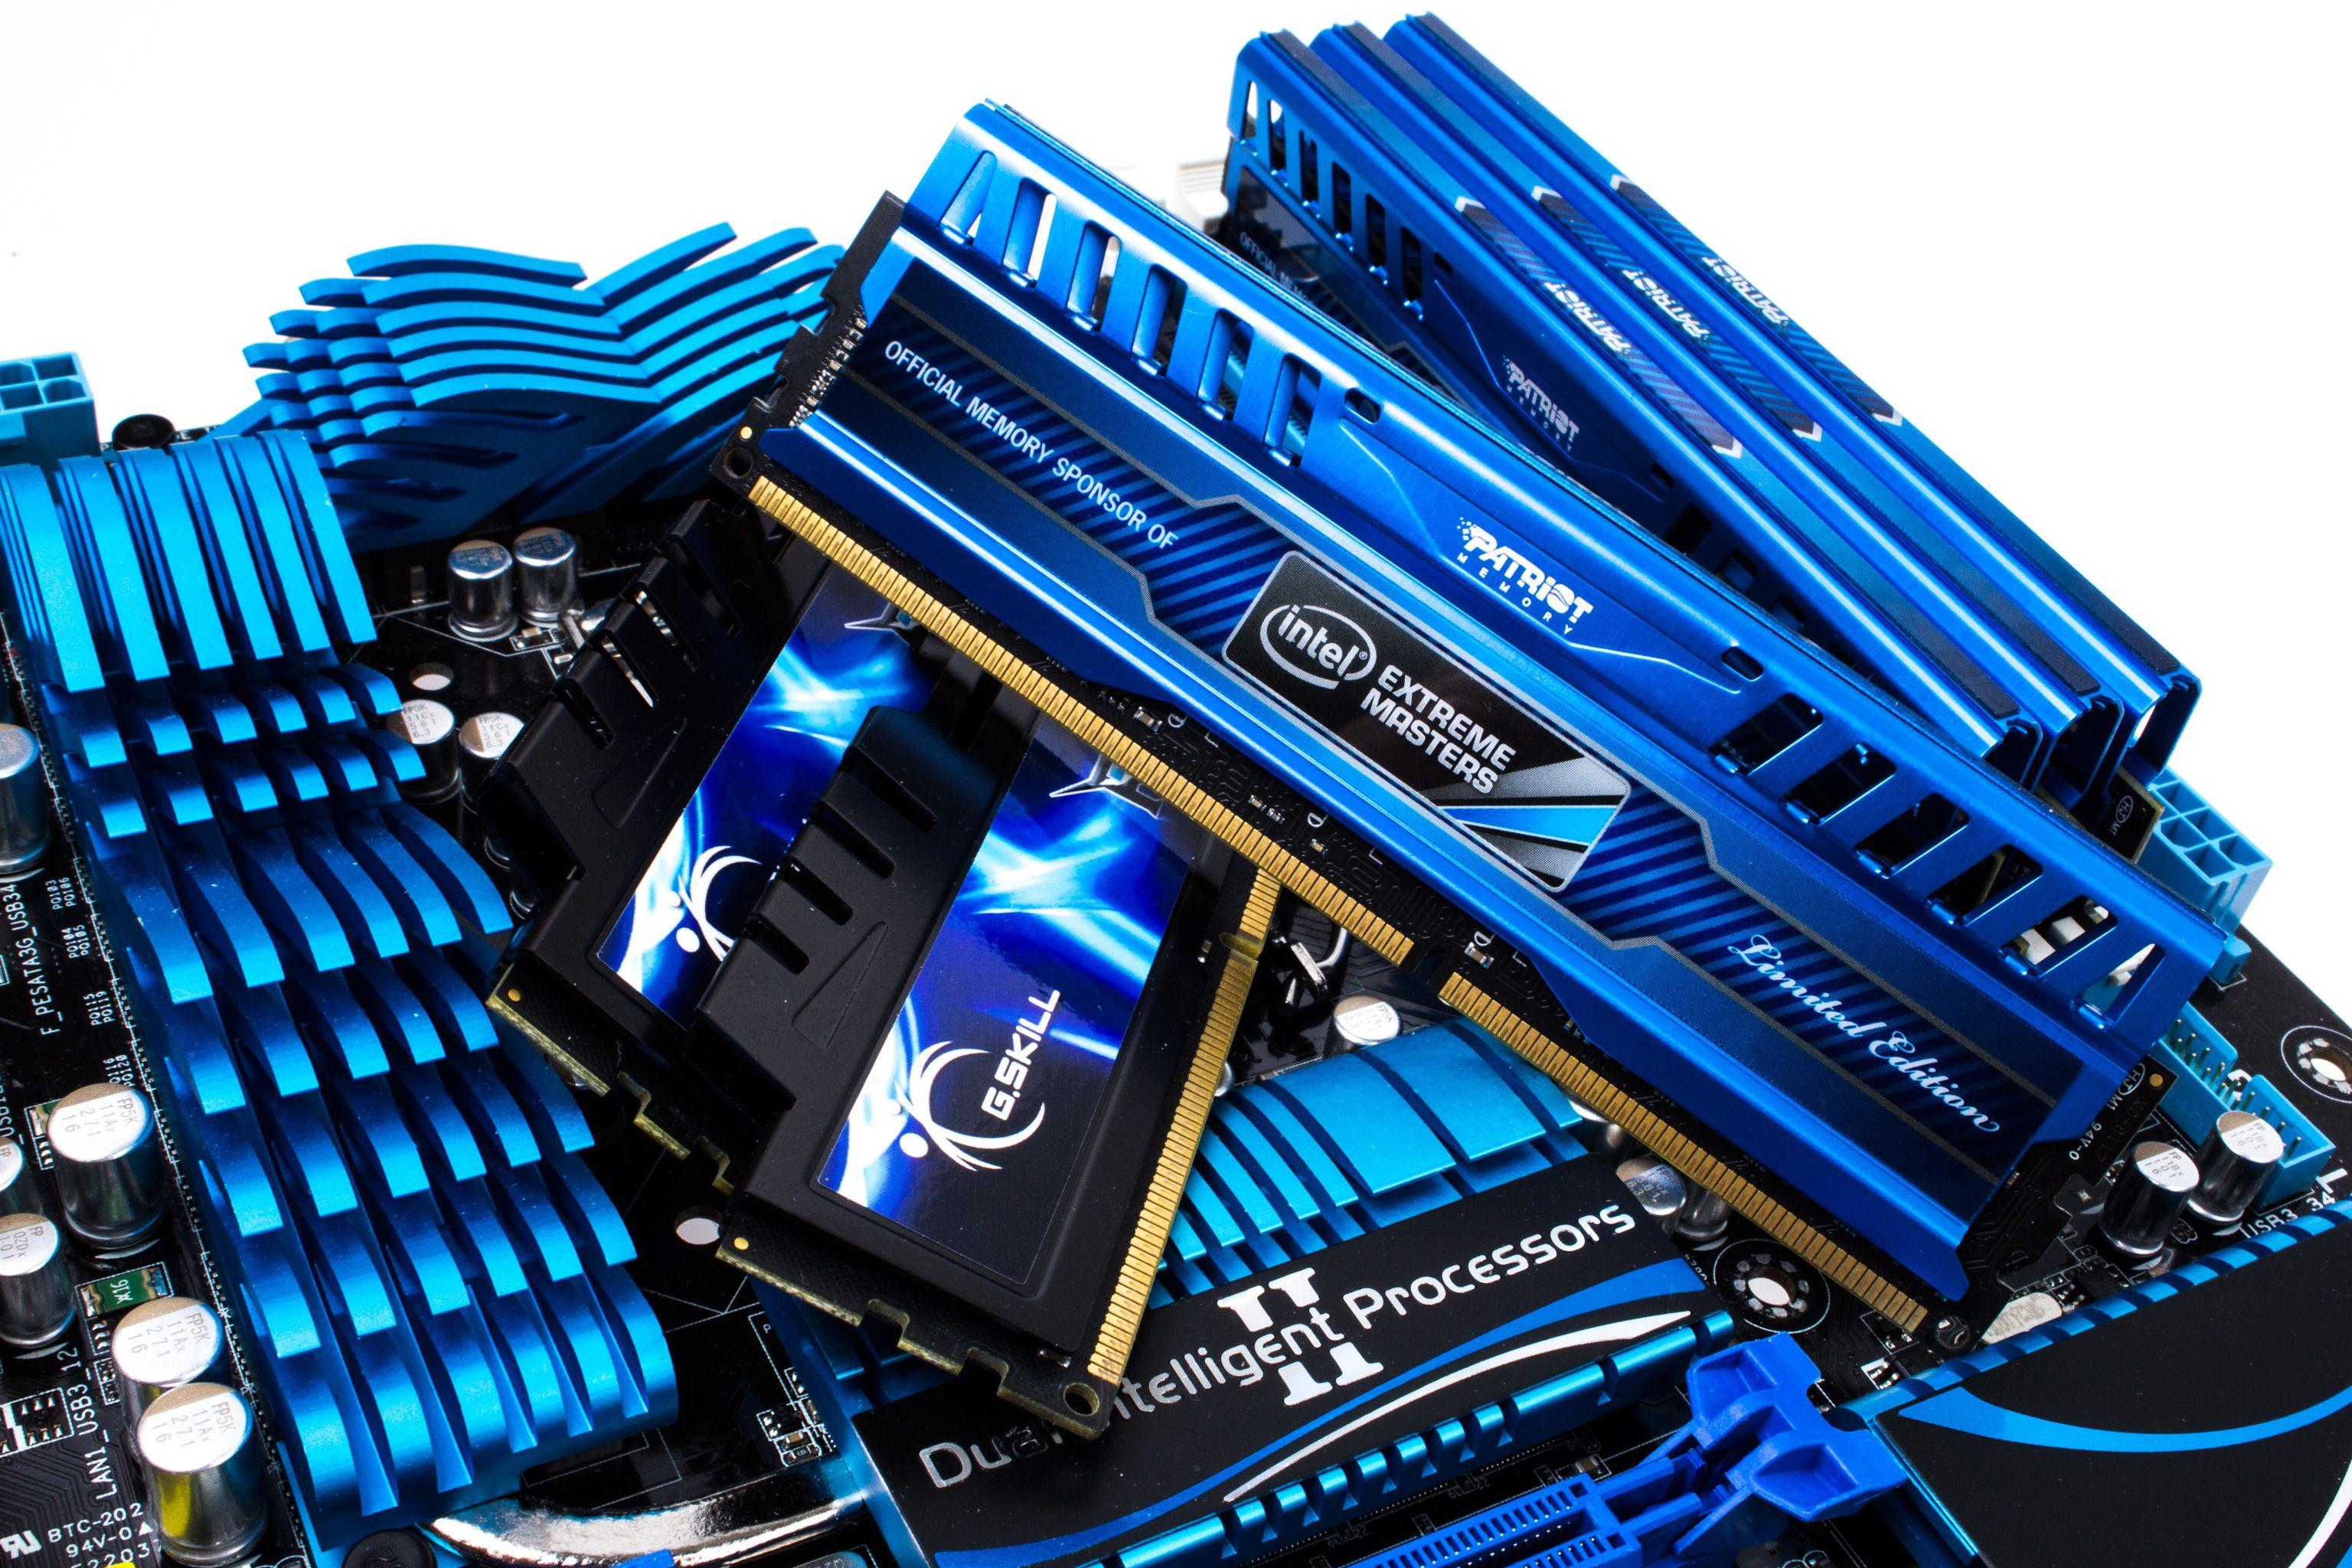 Det er mange som ikke er fornøyde med mindre de har minst 8 eller 16 GB minne i spillmaskinen sin. Men hjelper det?Foto: Varg Aamo, Hardware.no